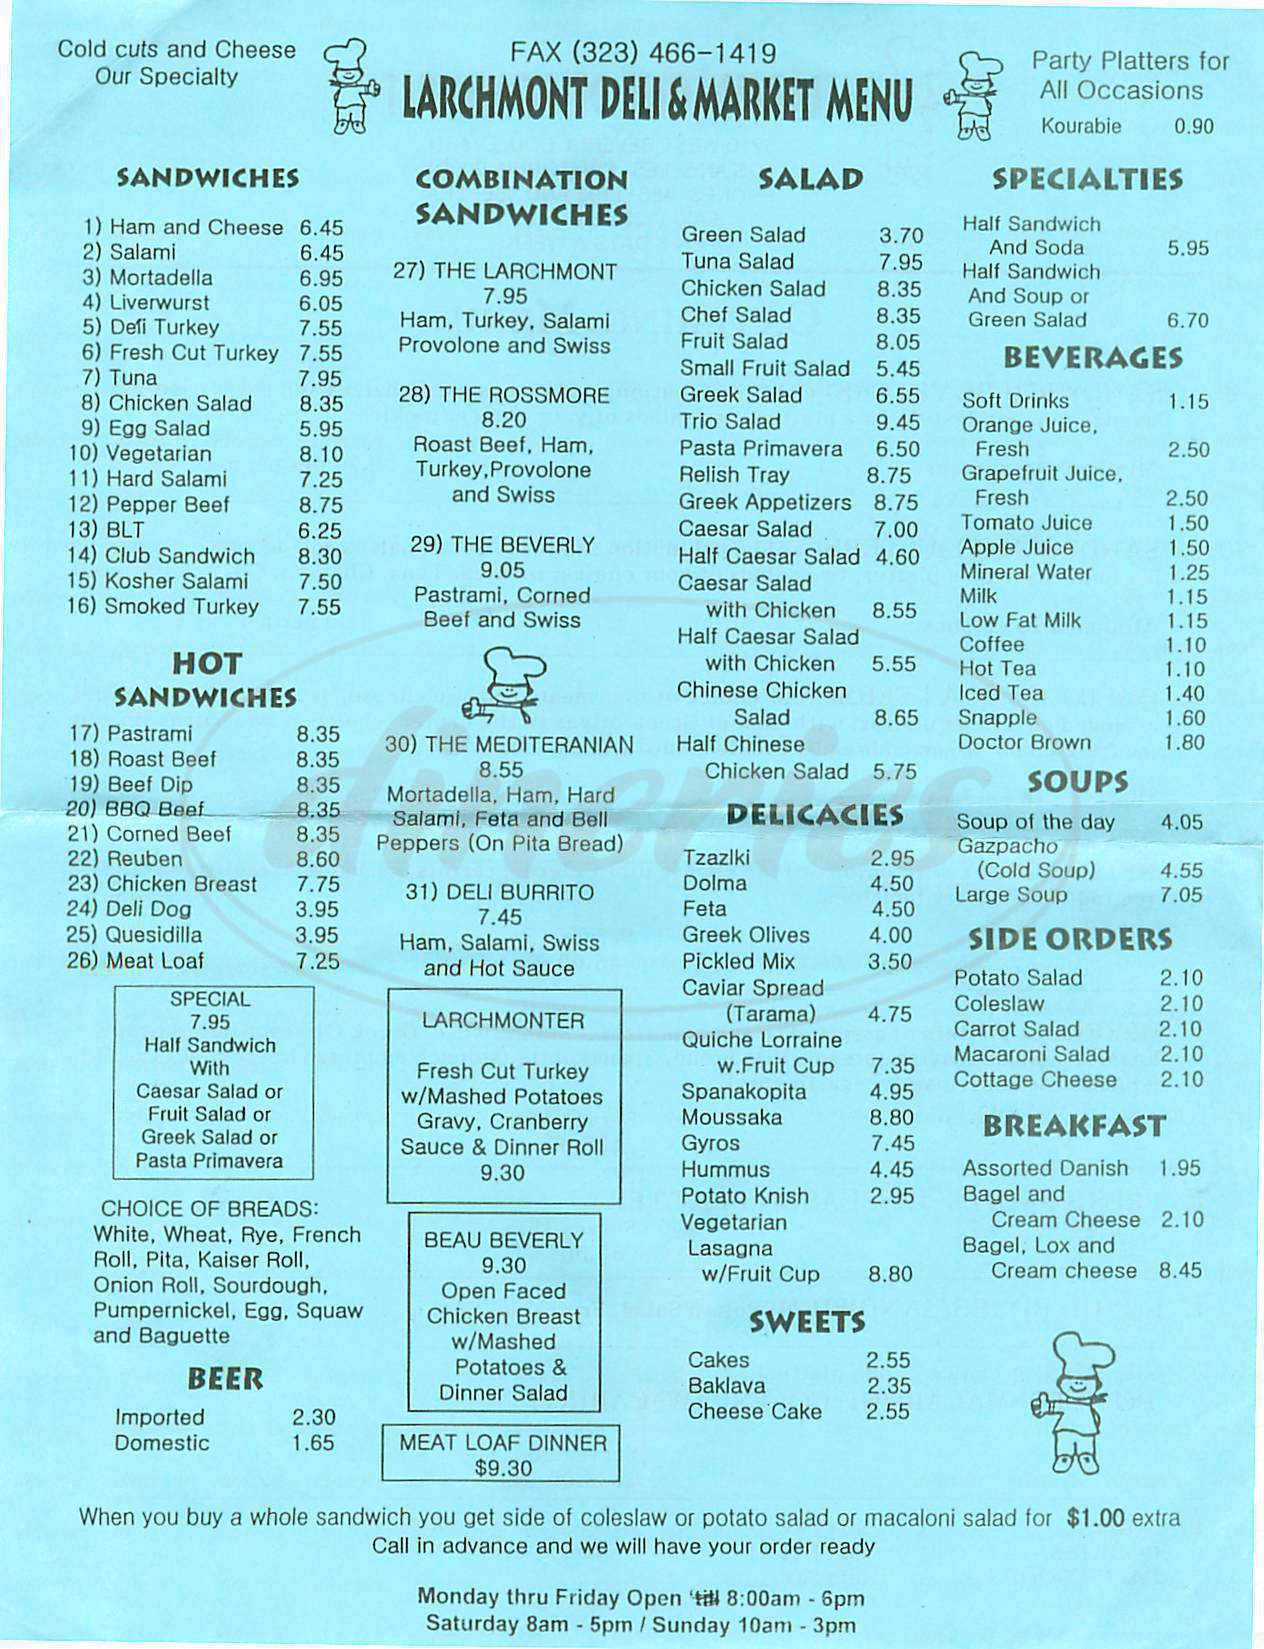 menu for Larchmont Deli